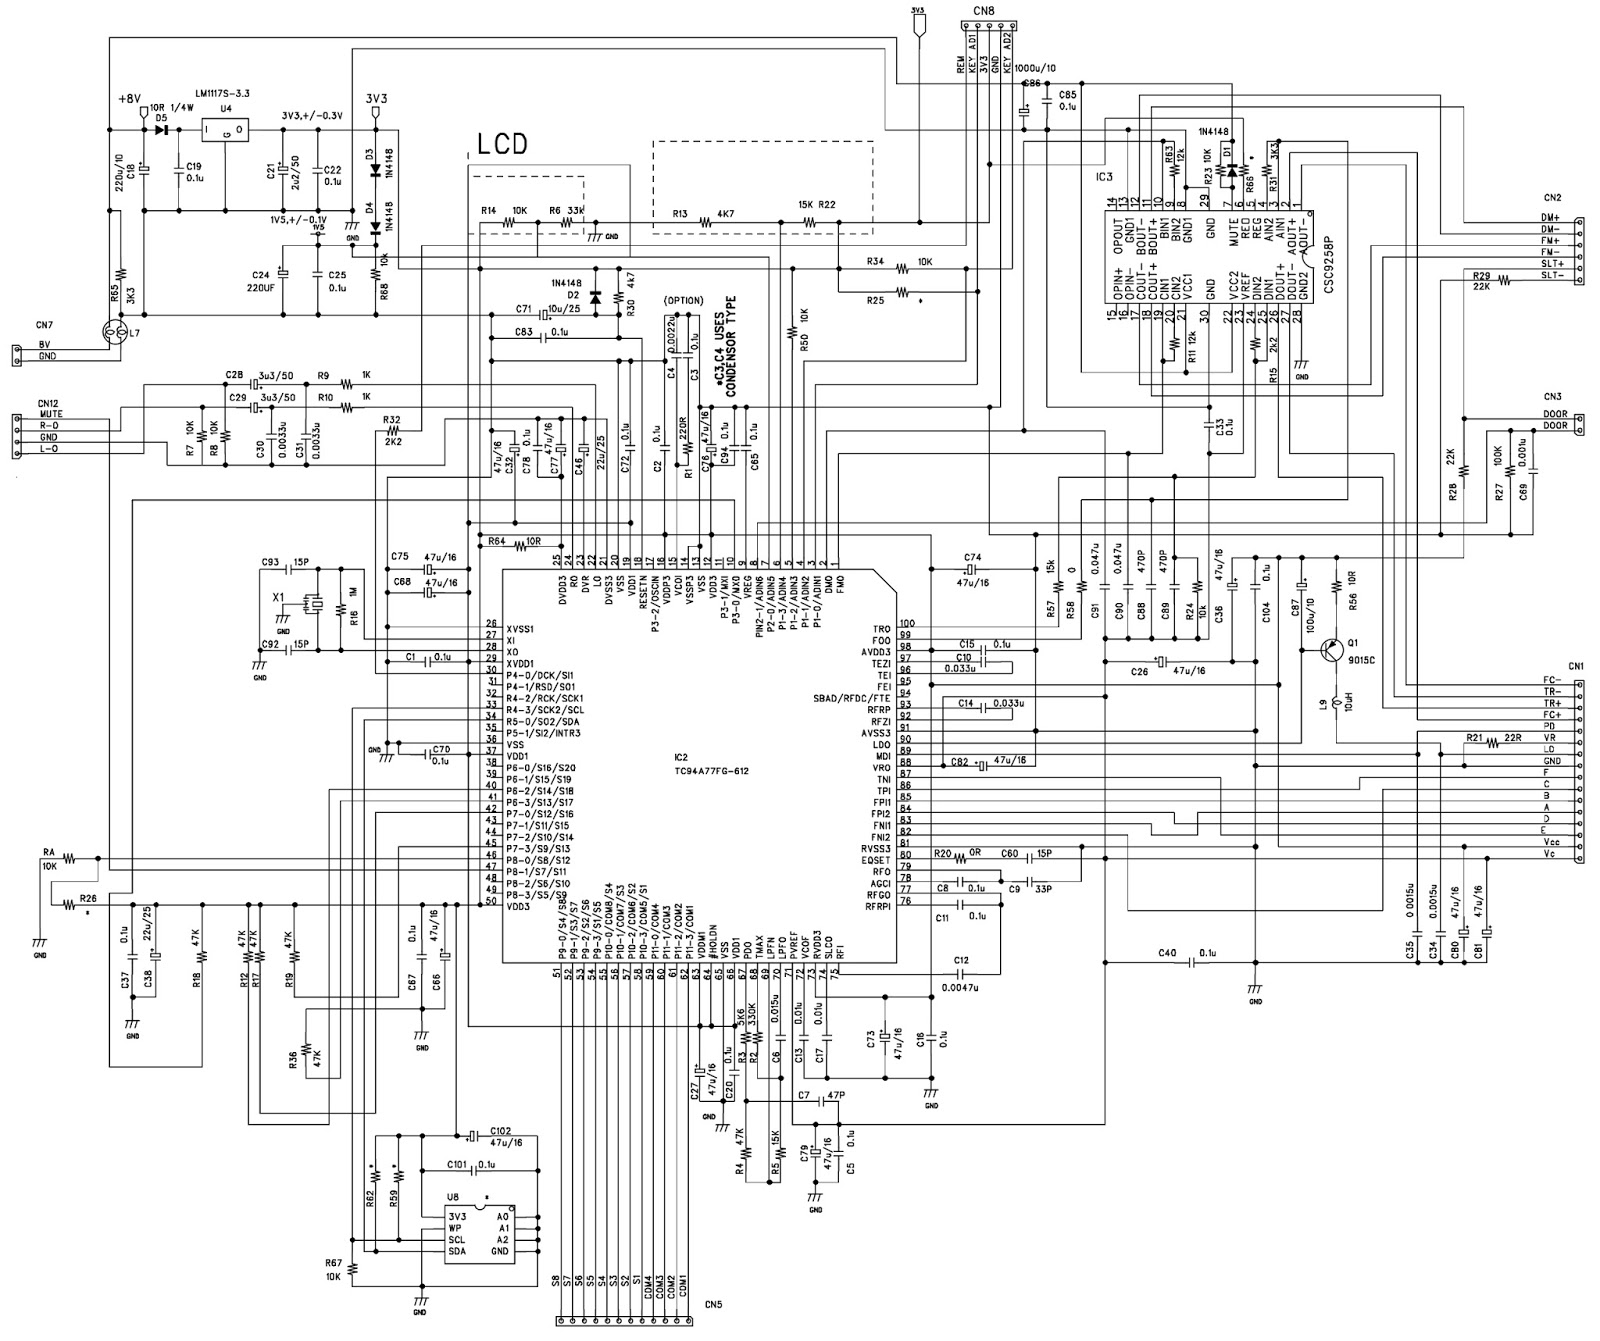 Integrated Circuit 555 Automotivecircuit Circuit Diagram Seekic